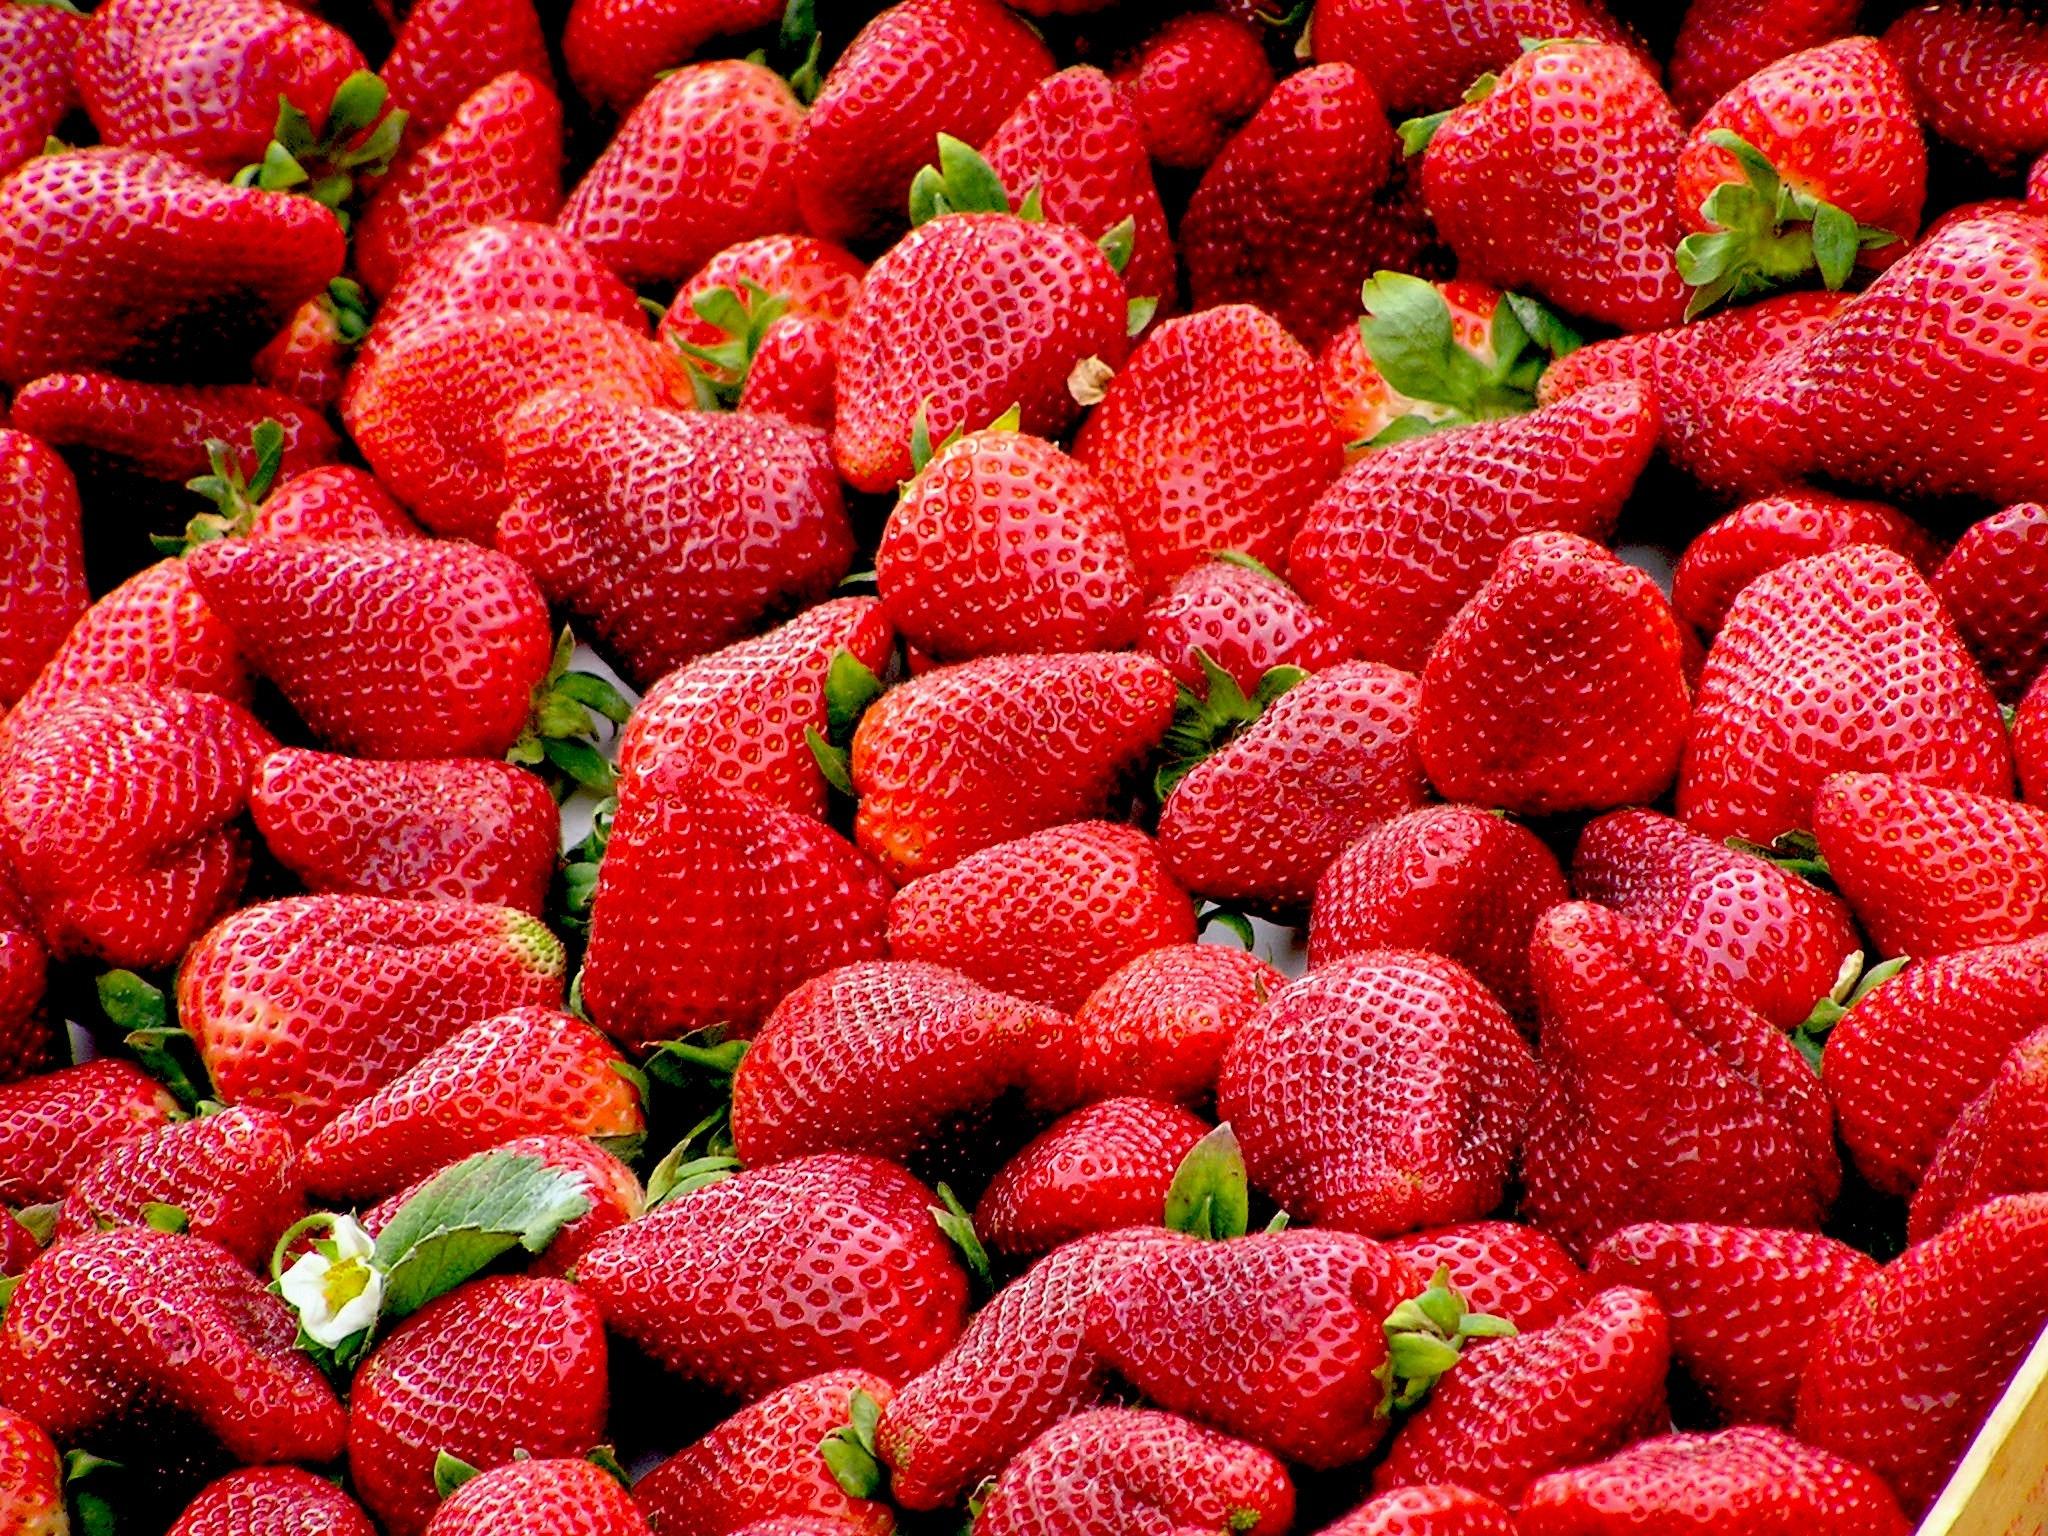 1000 Interesting Fruits Photos 183 Pexels 183 Free Stock Photos